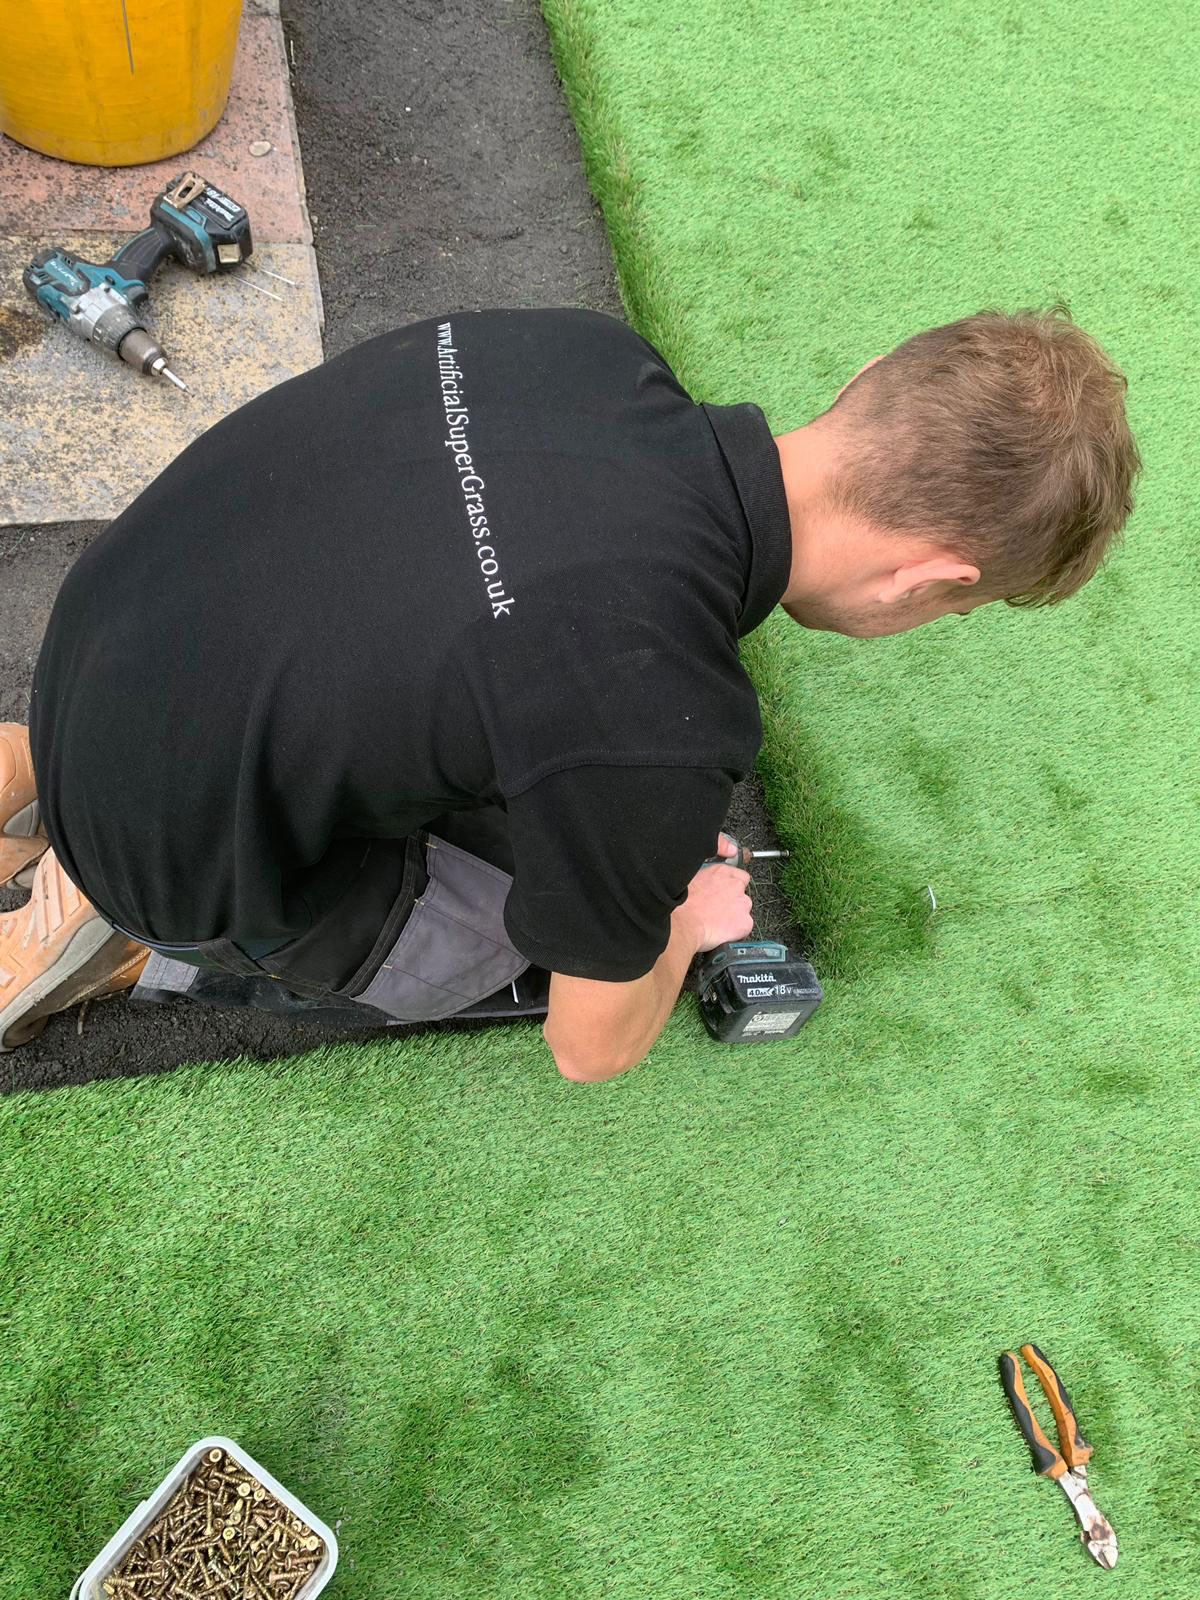 Laying Artificial Grass Scarborough Artificial Super Grass